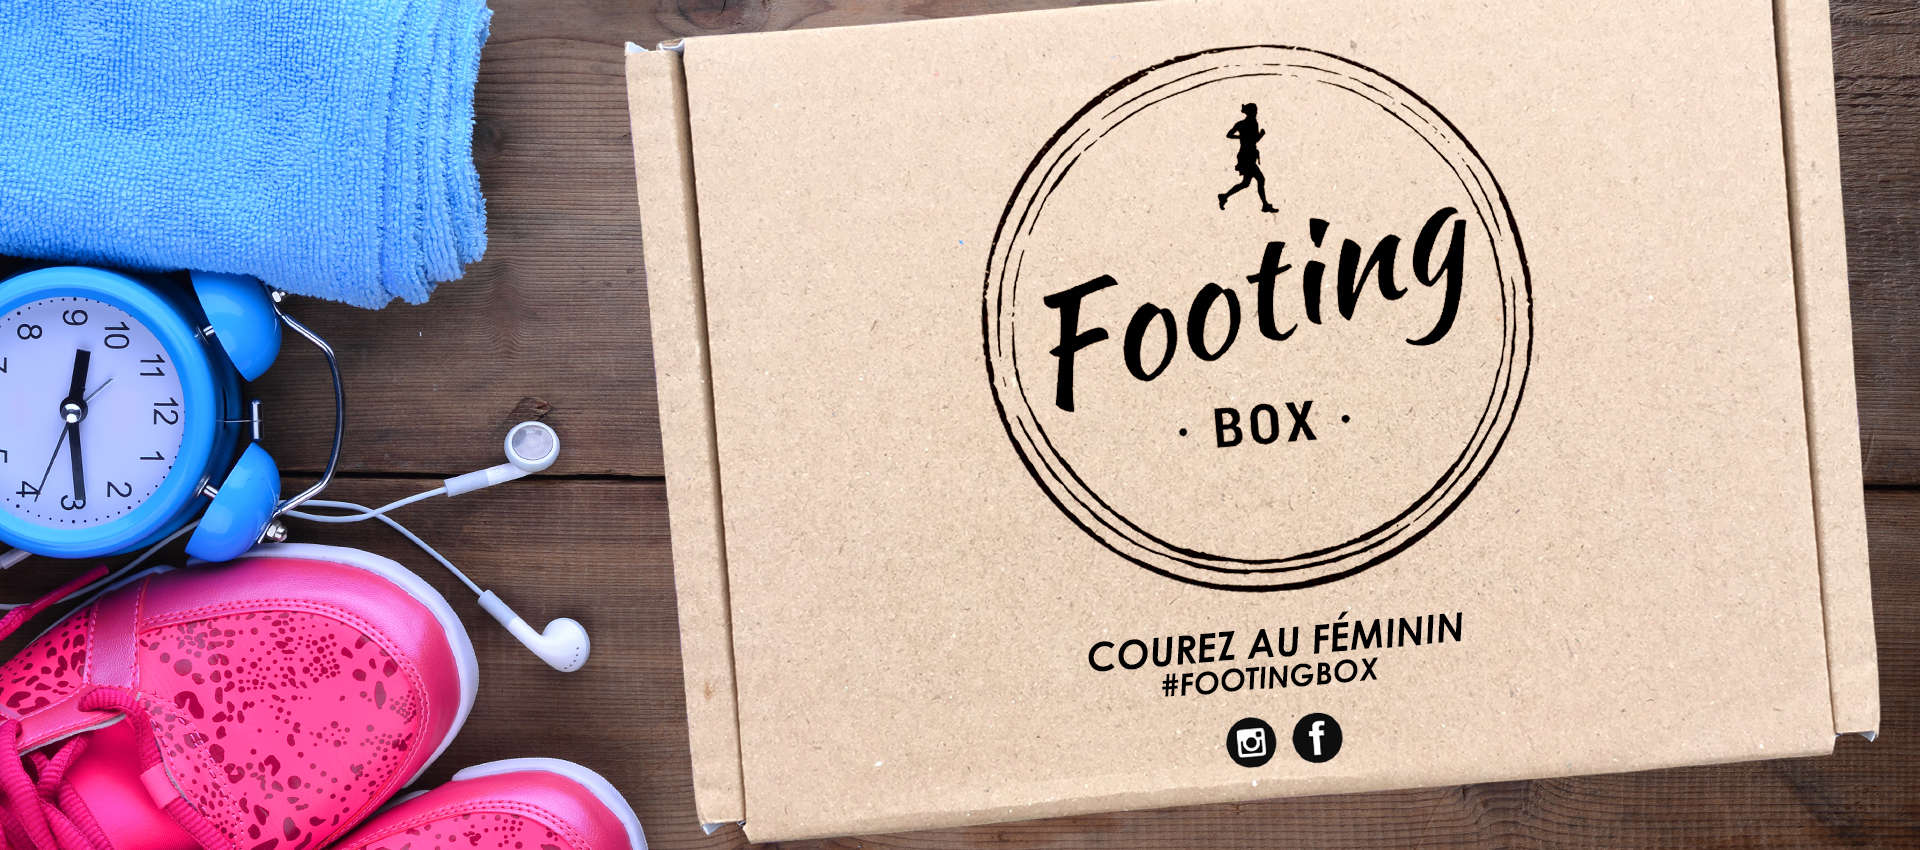 FootingBox